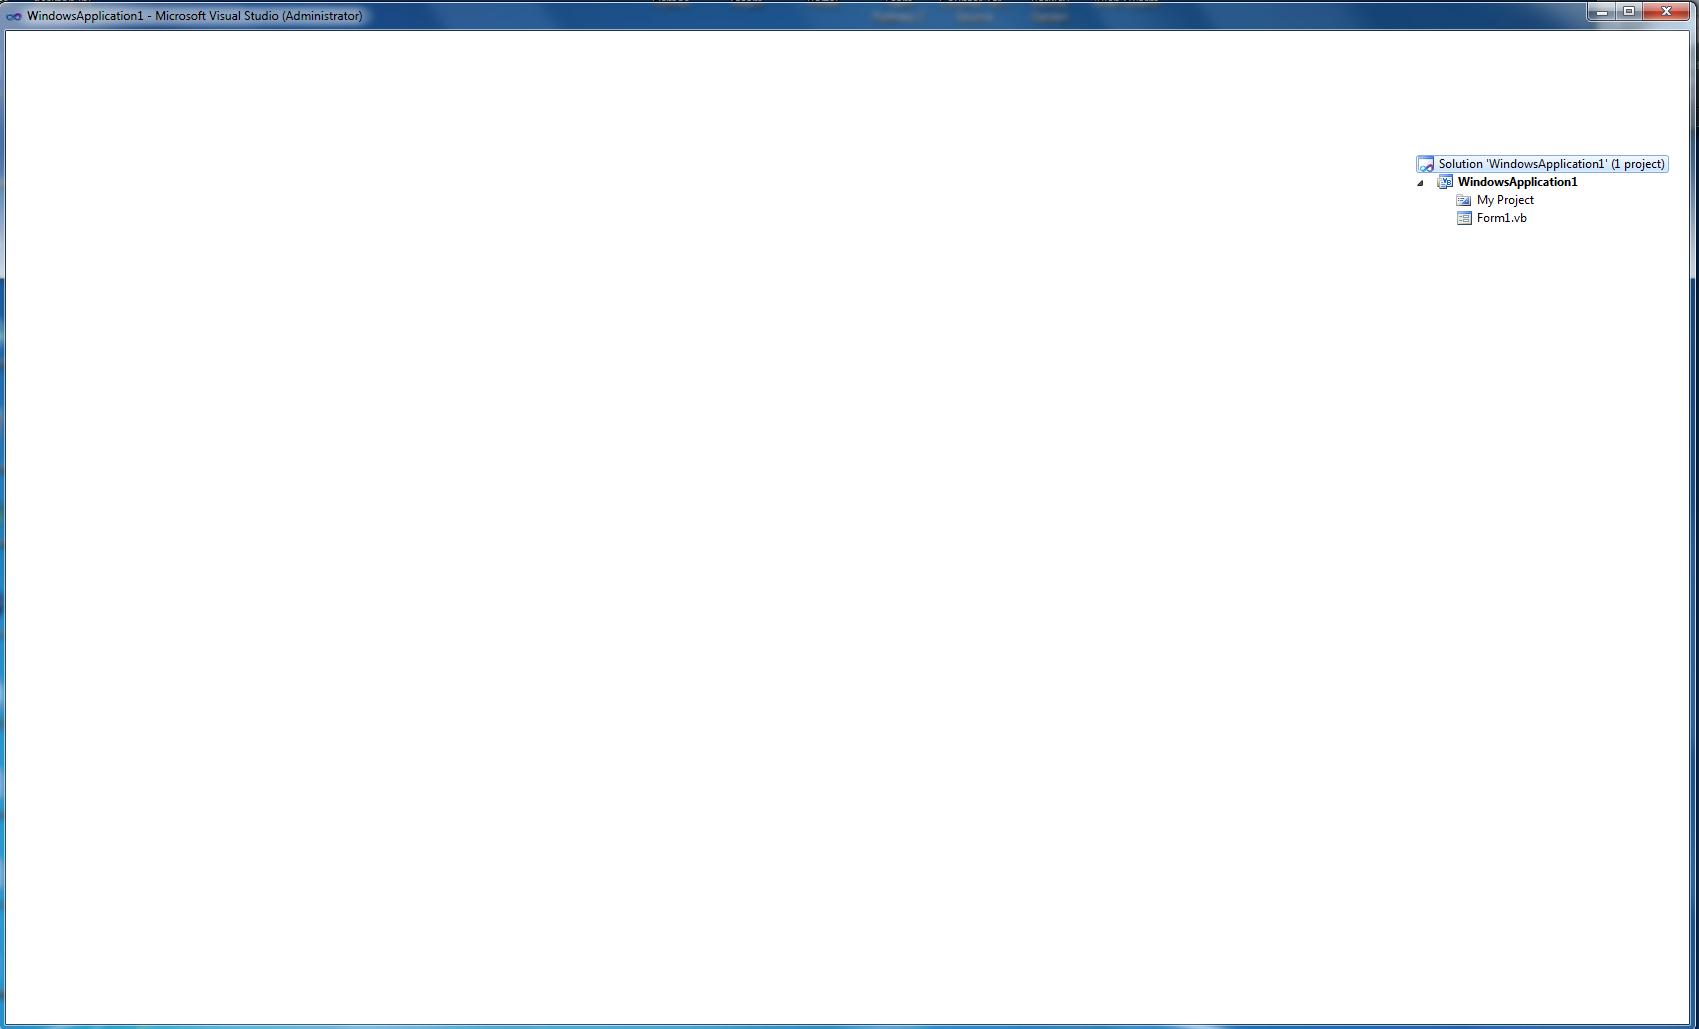 VS2010 Blank screen